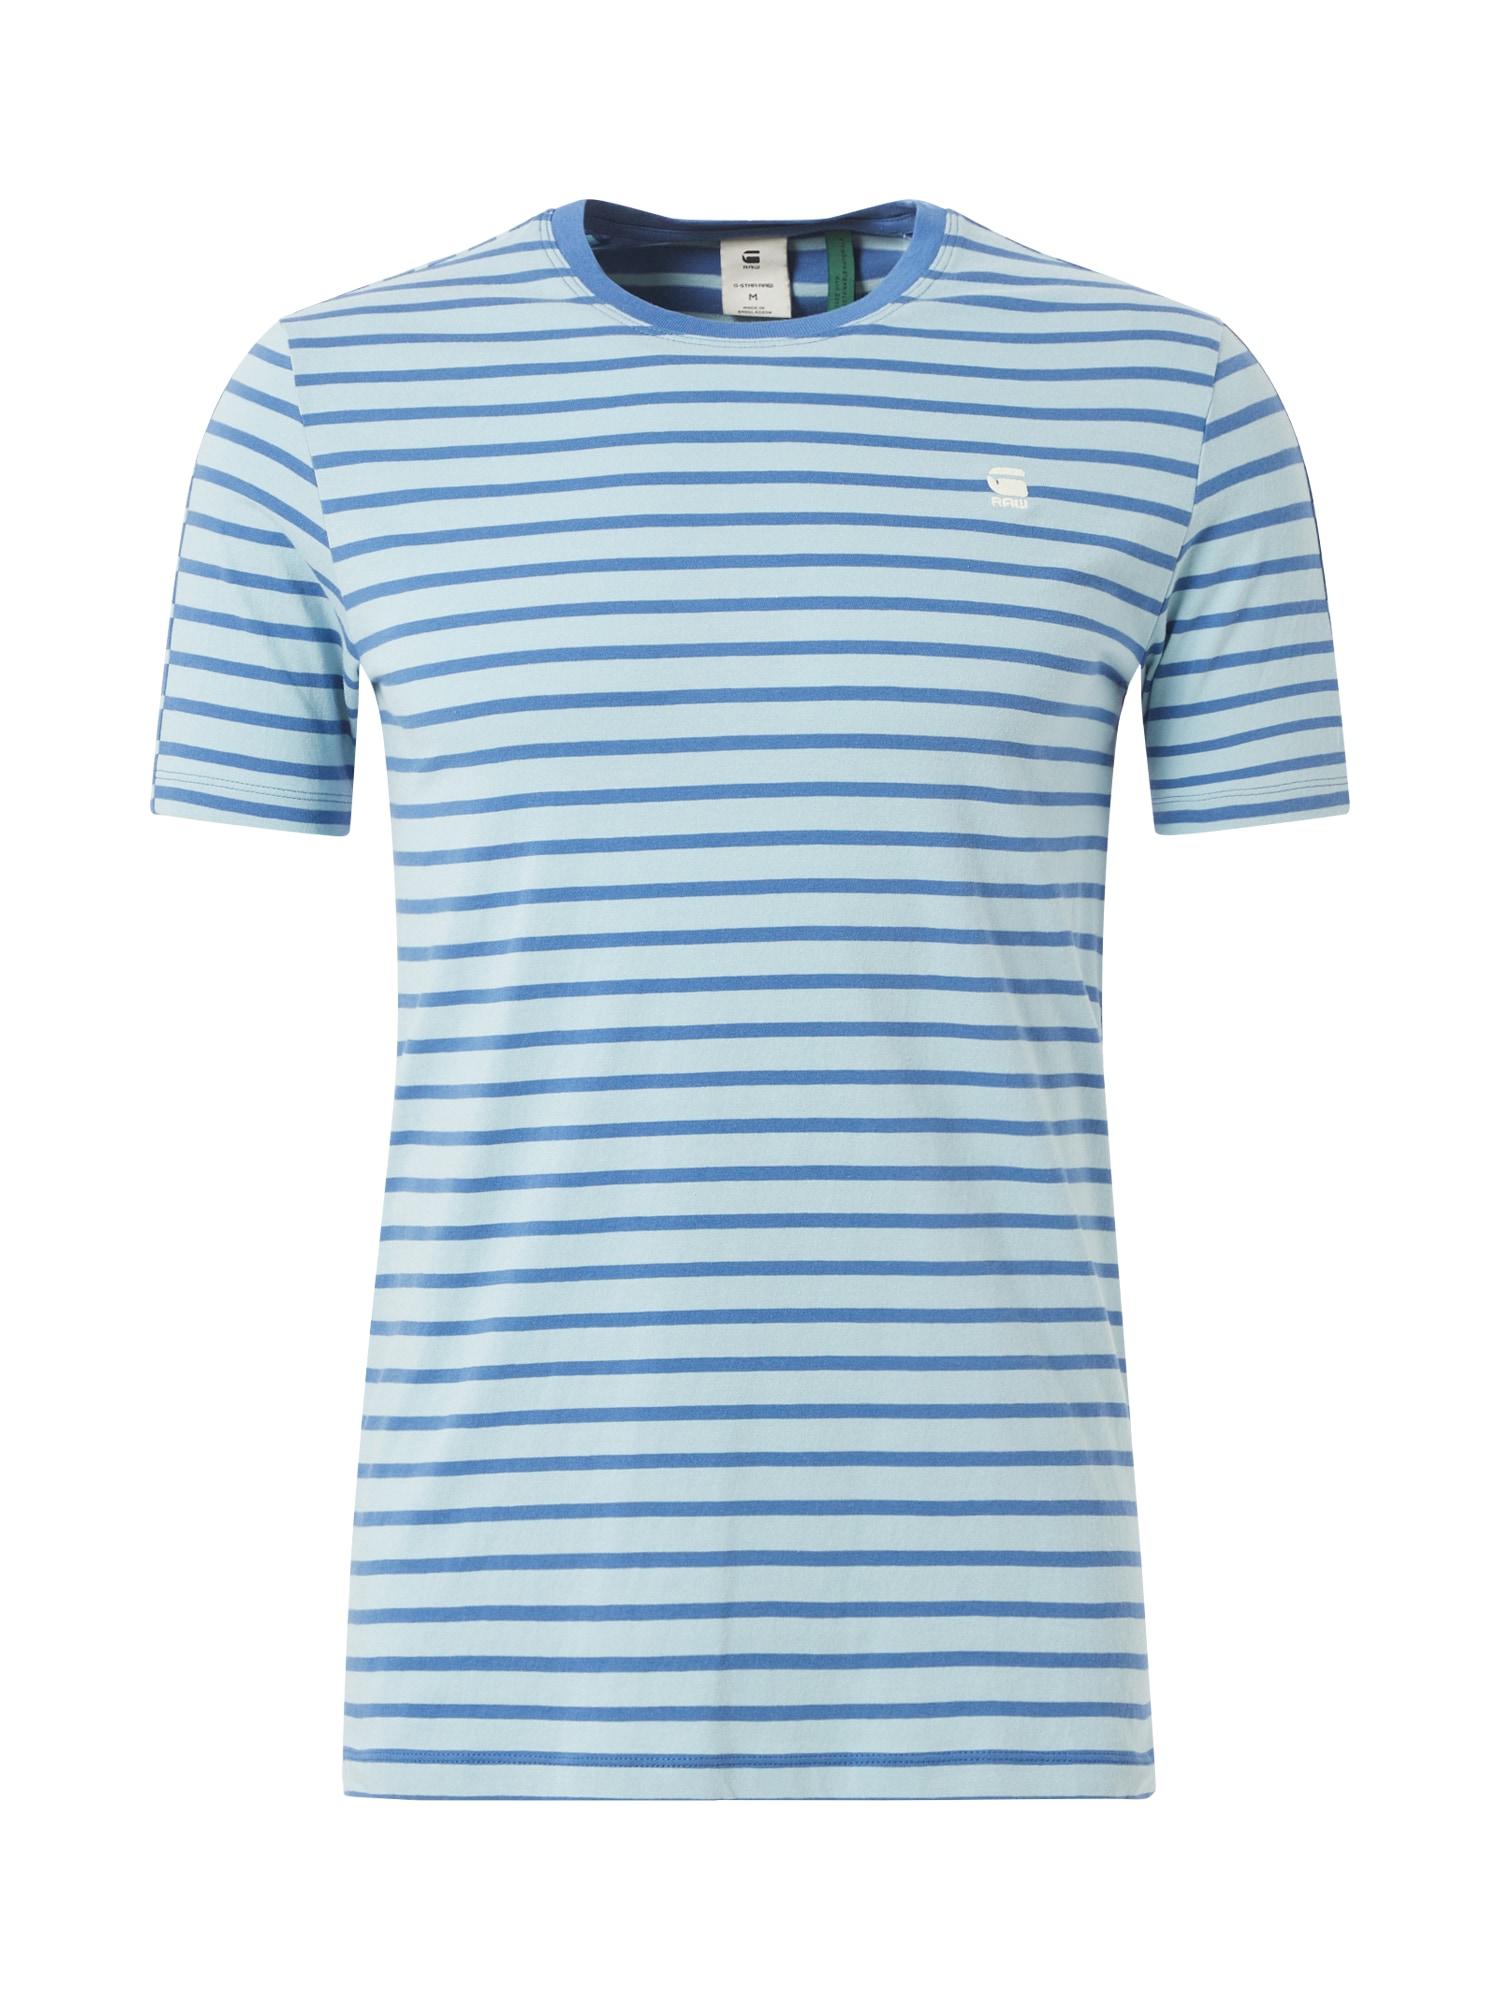 G-Star RAW Marškinėliai 'Korpaz stripe gr slim r t s\s' mėlyna / šviesiai mėlyna